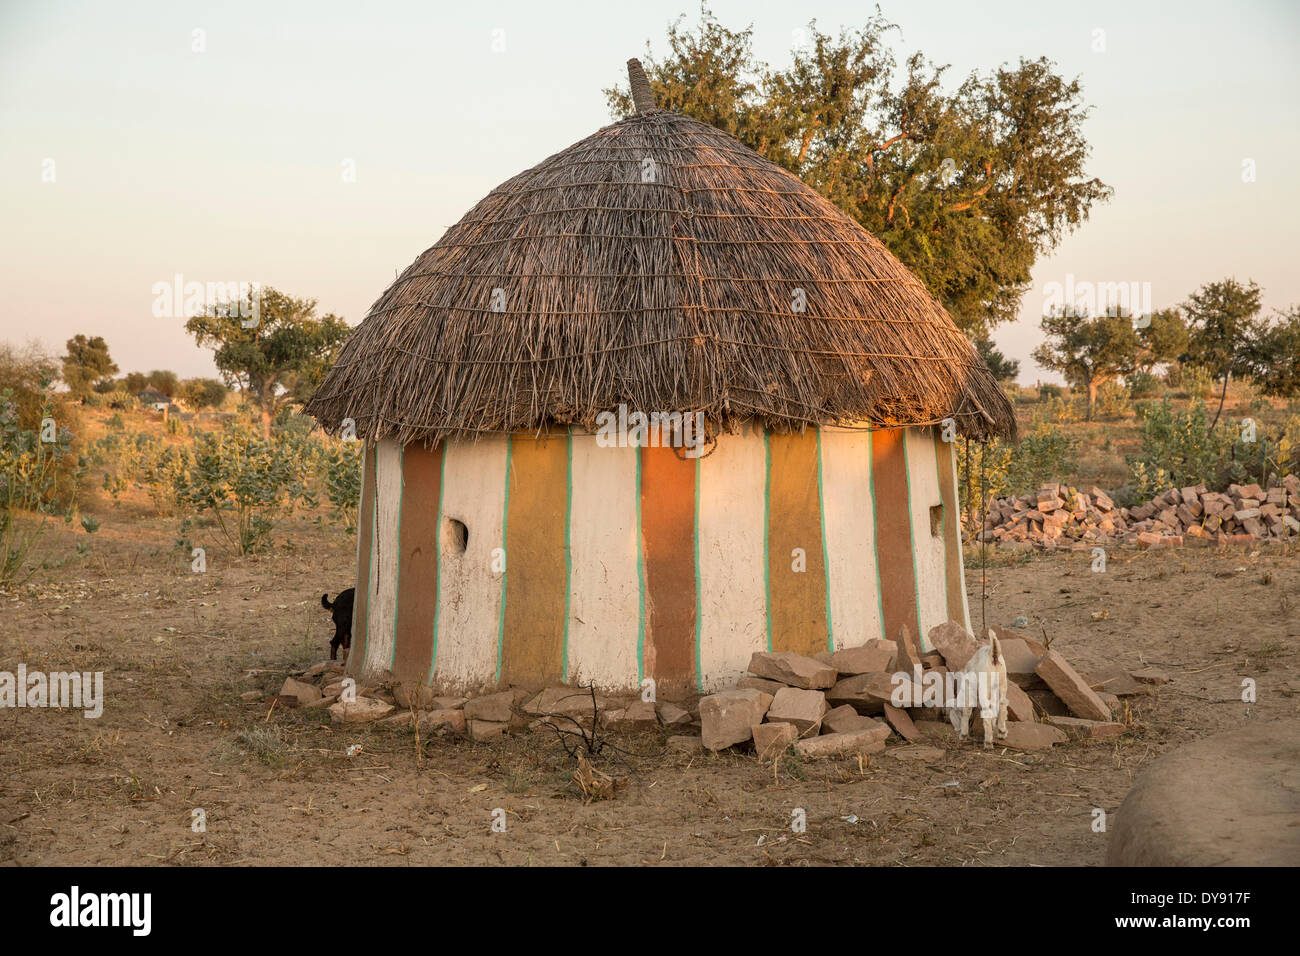 Casa Rural, Setrawa, de Asia, de la India, Rajastán, redondo, casa Imagen De Stock